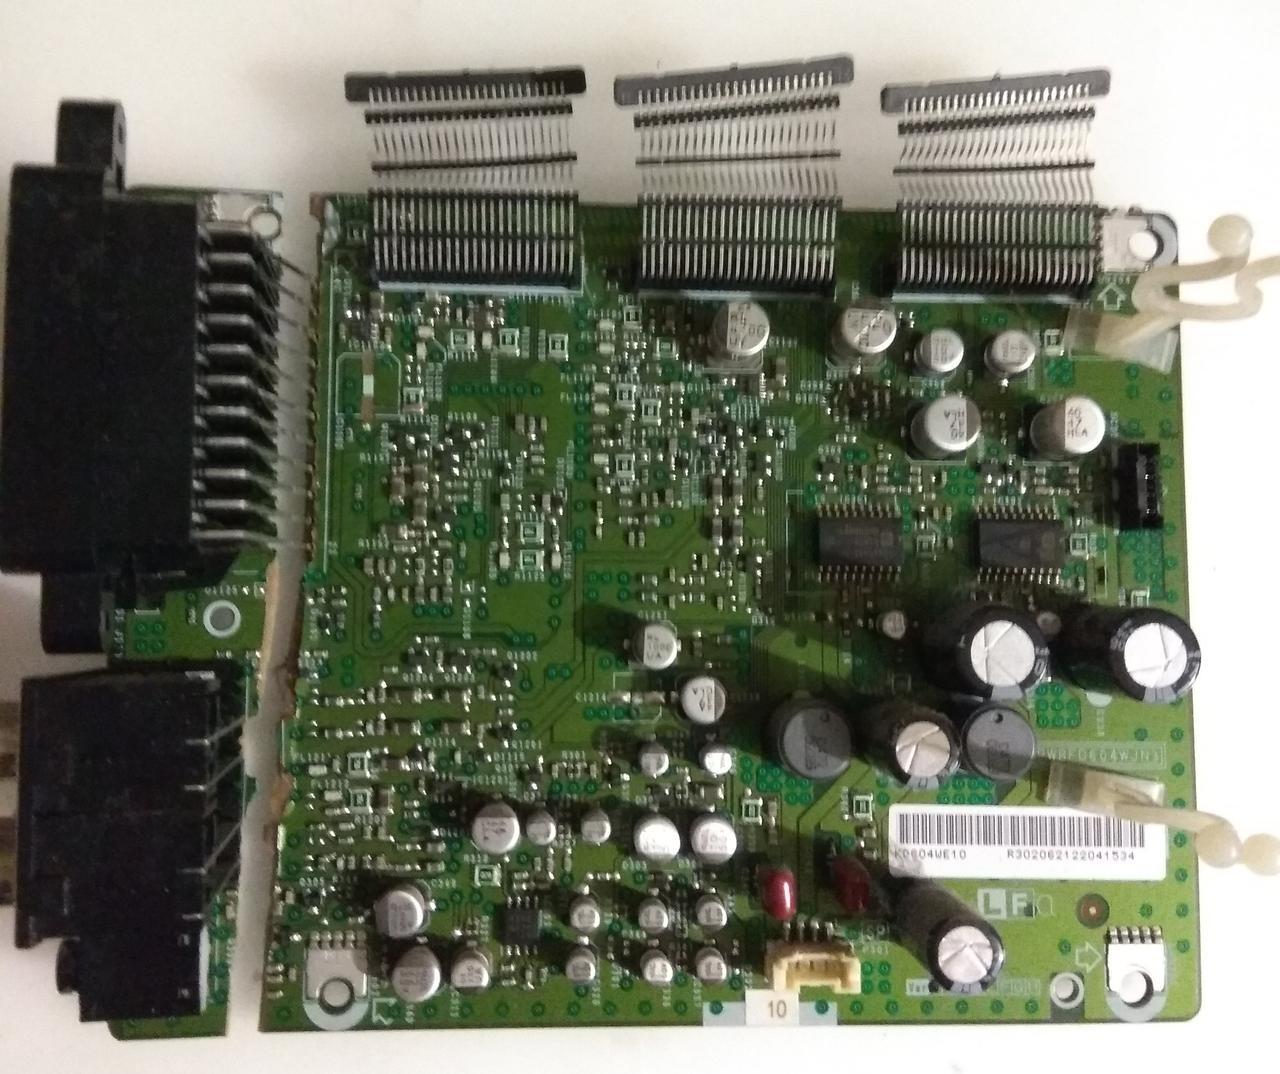 Материнская плата QPWBFD604WJN3 к телевизору Sharp lc-37bt8e